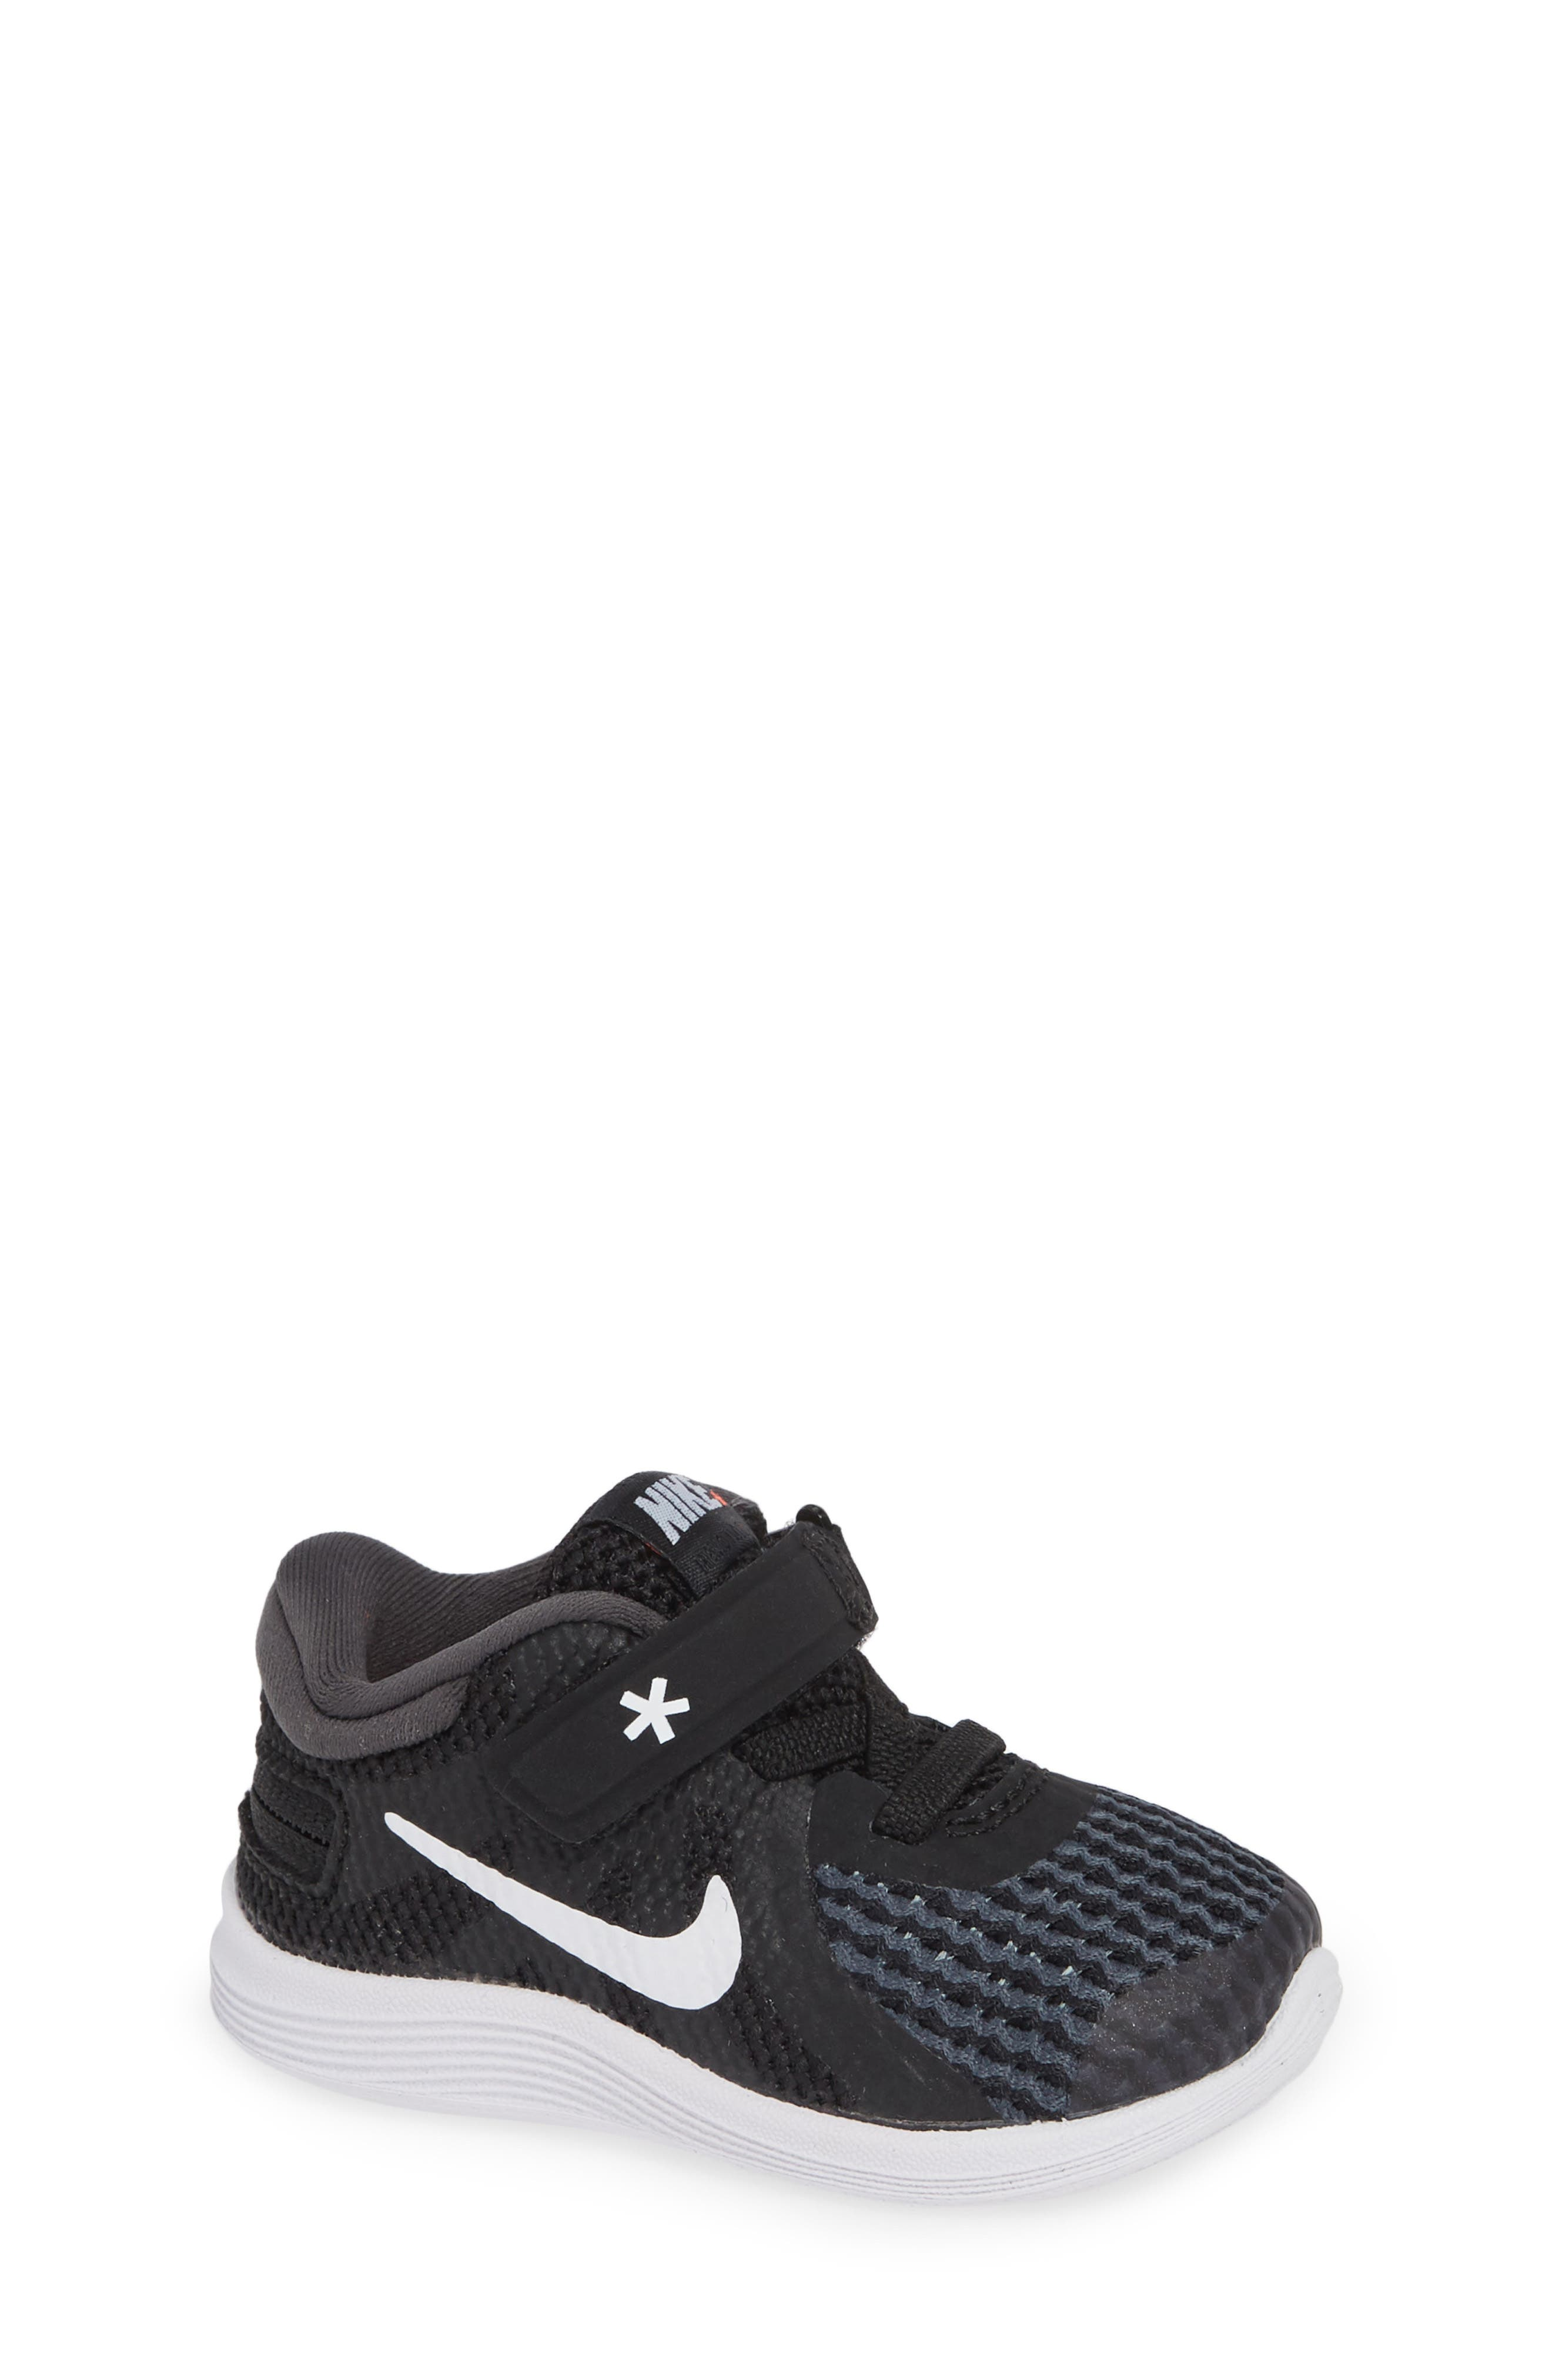 NIKE,                             Revolution 4 Flyease Sneaker,                             Main thumbnail 1, color,                             BLACK TOTAL CRIMSON